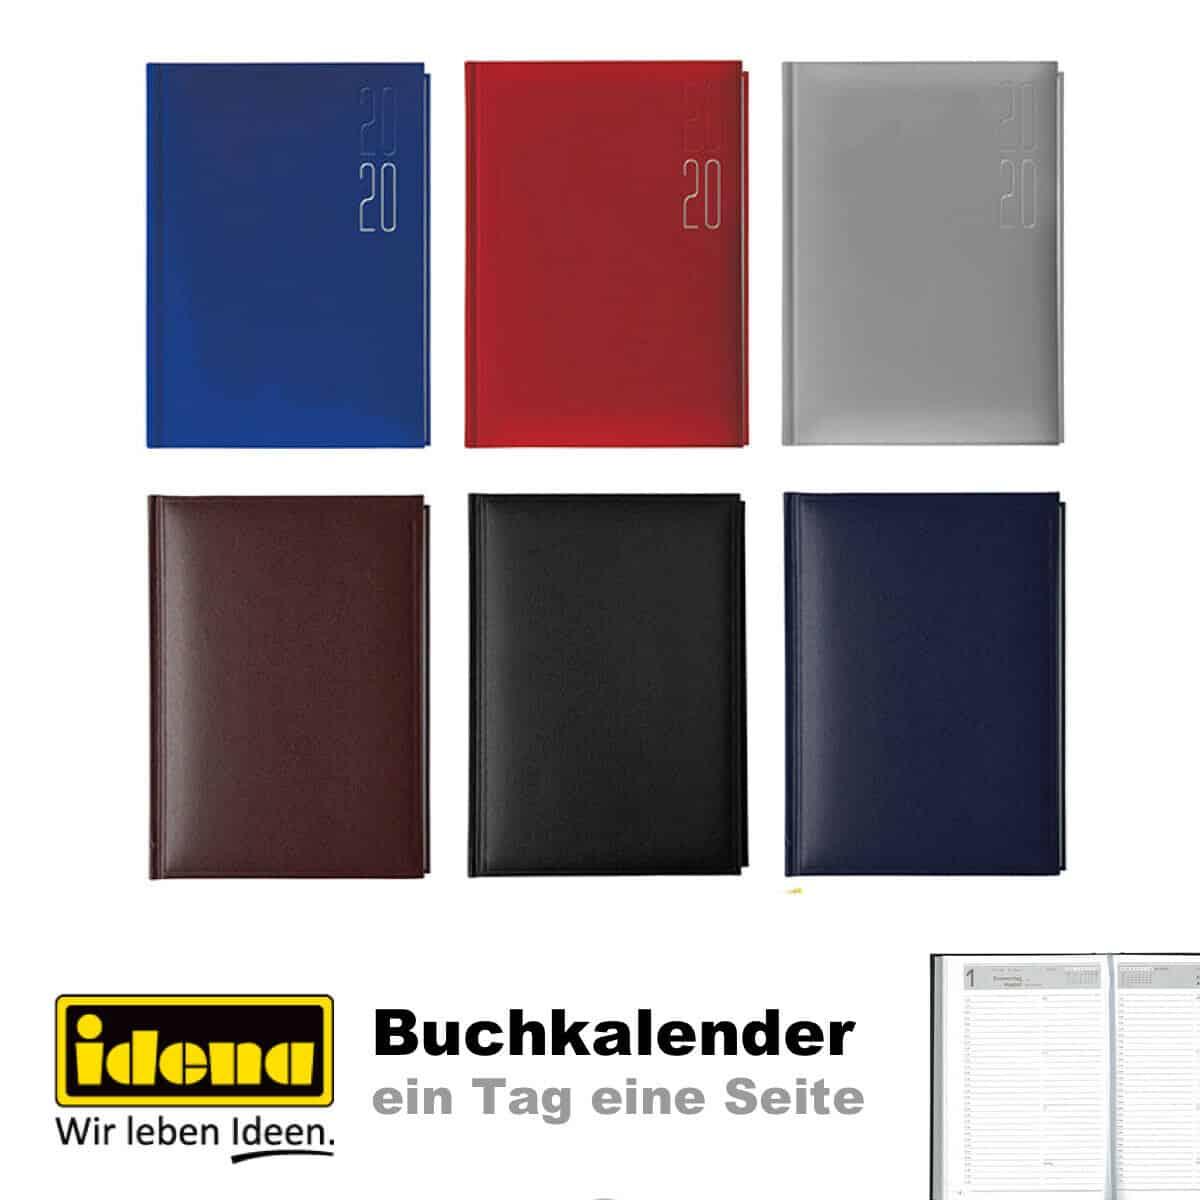 IDENA Buchkalender 2019 Tageskalender Chefkalender A5 1 Tag = 1 Seite Kalender